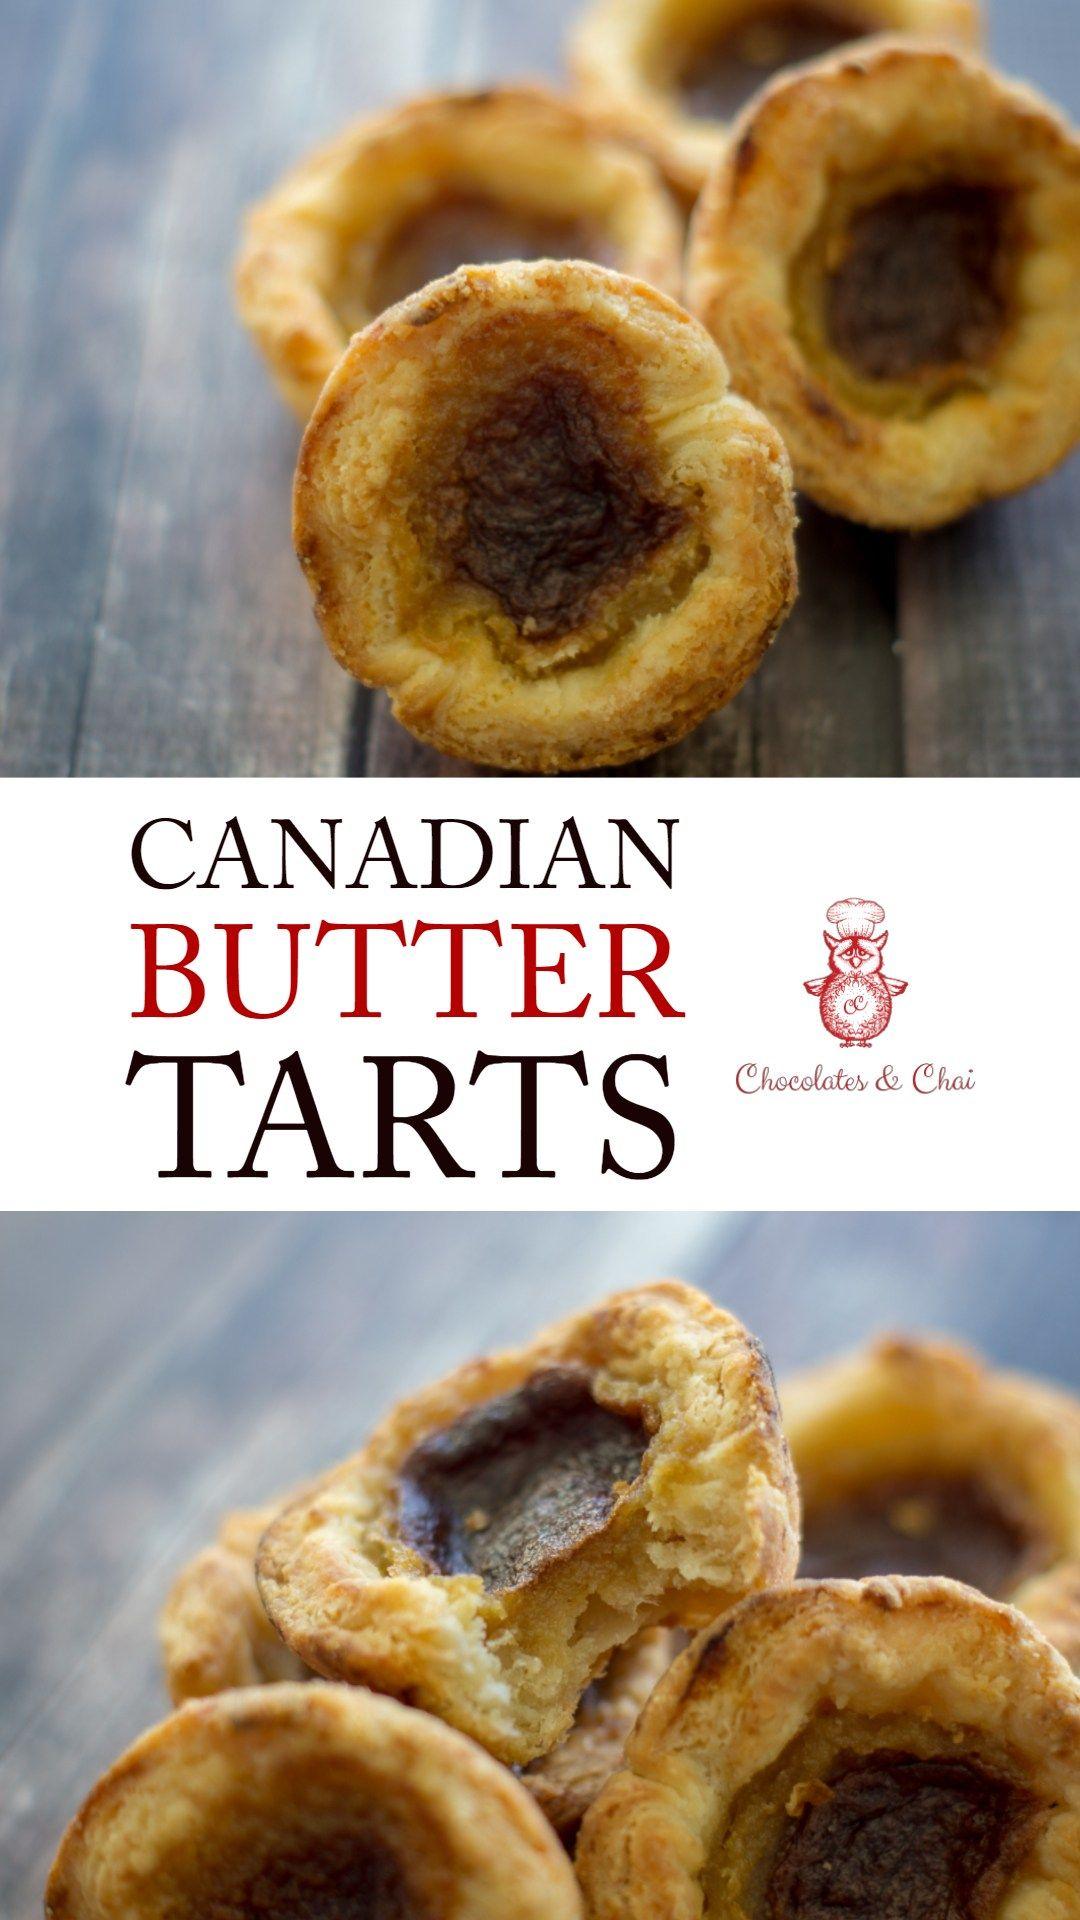 Canadian Butter Tarts Recipe Canadian butter tarts